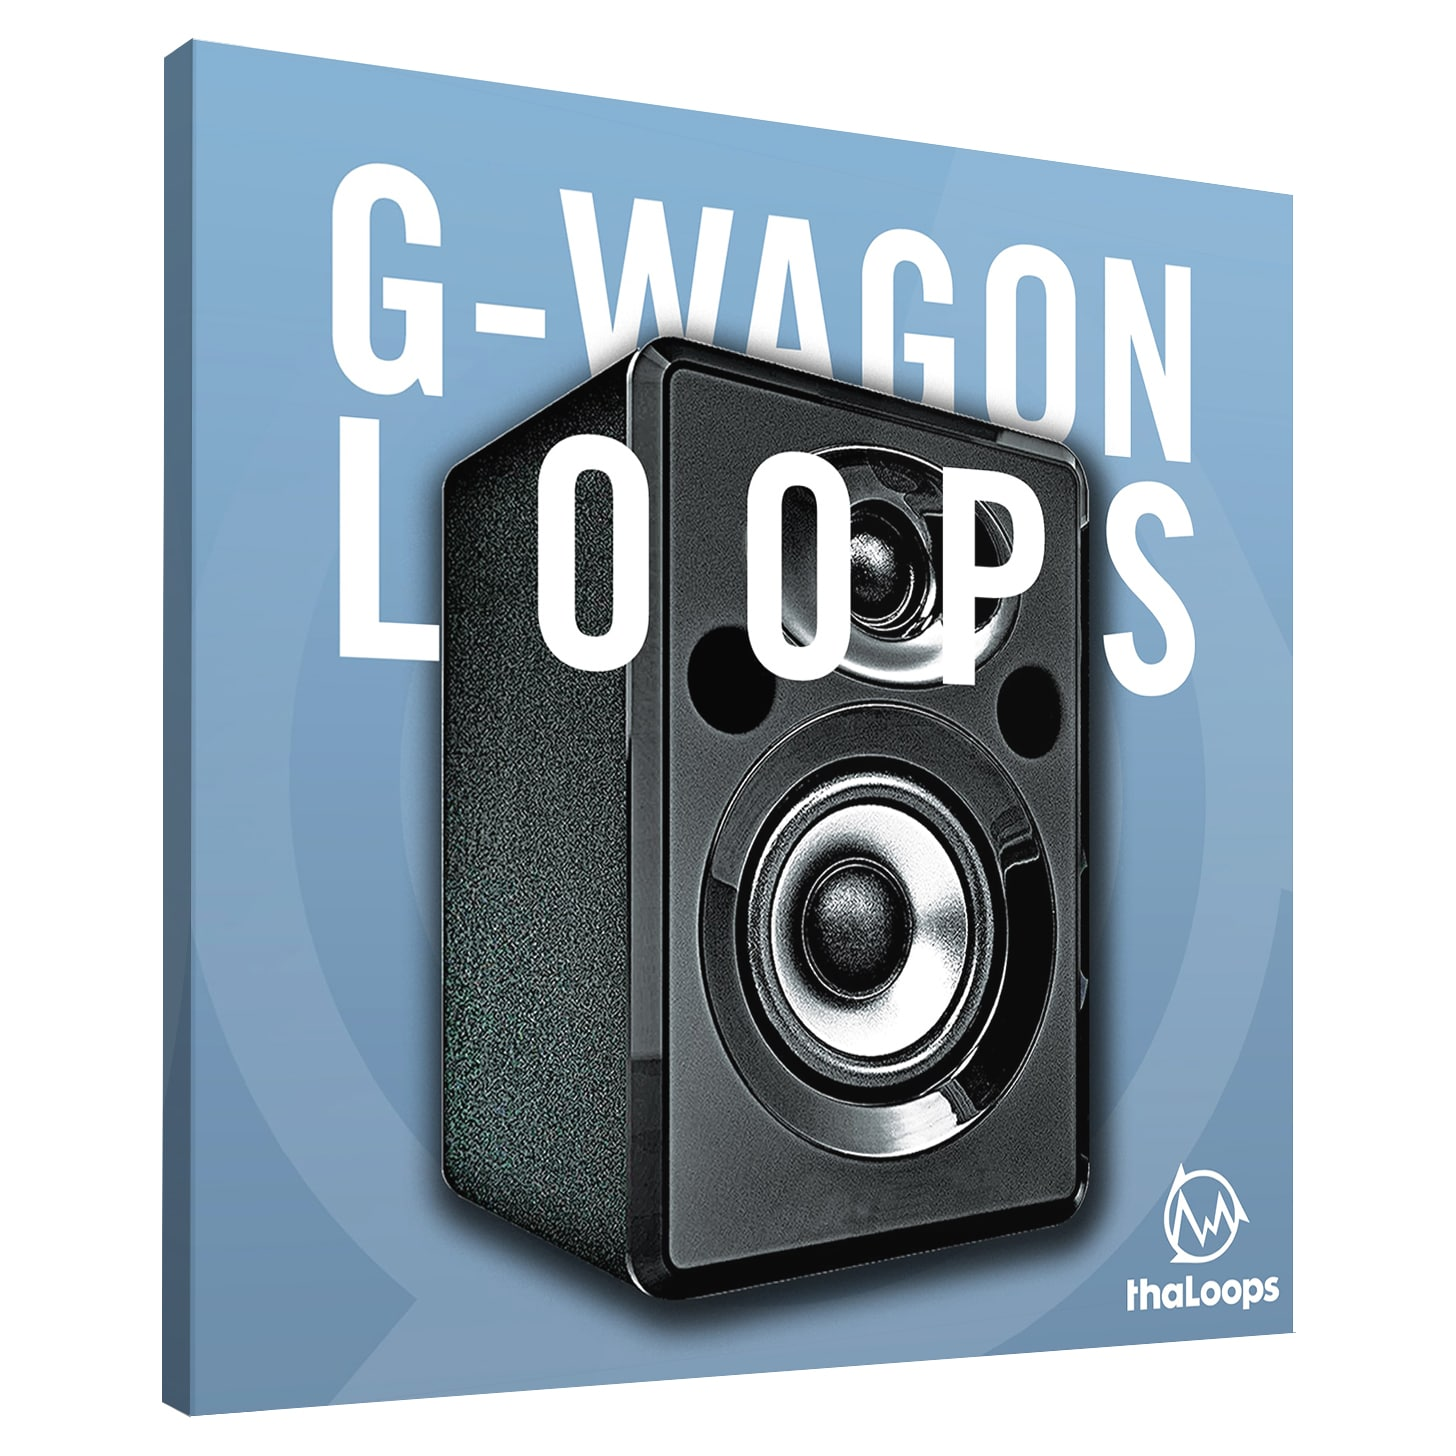 G-Wagon Loops